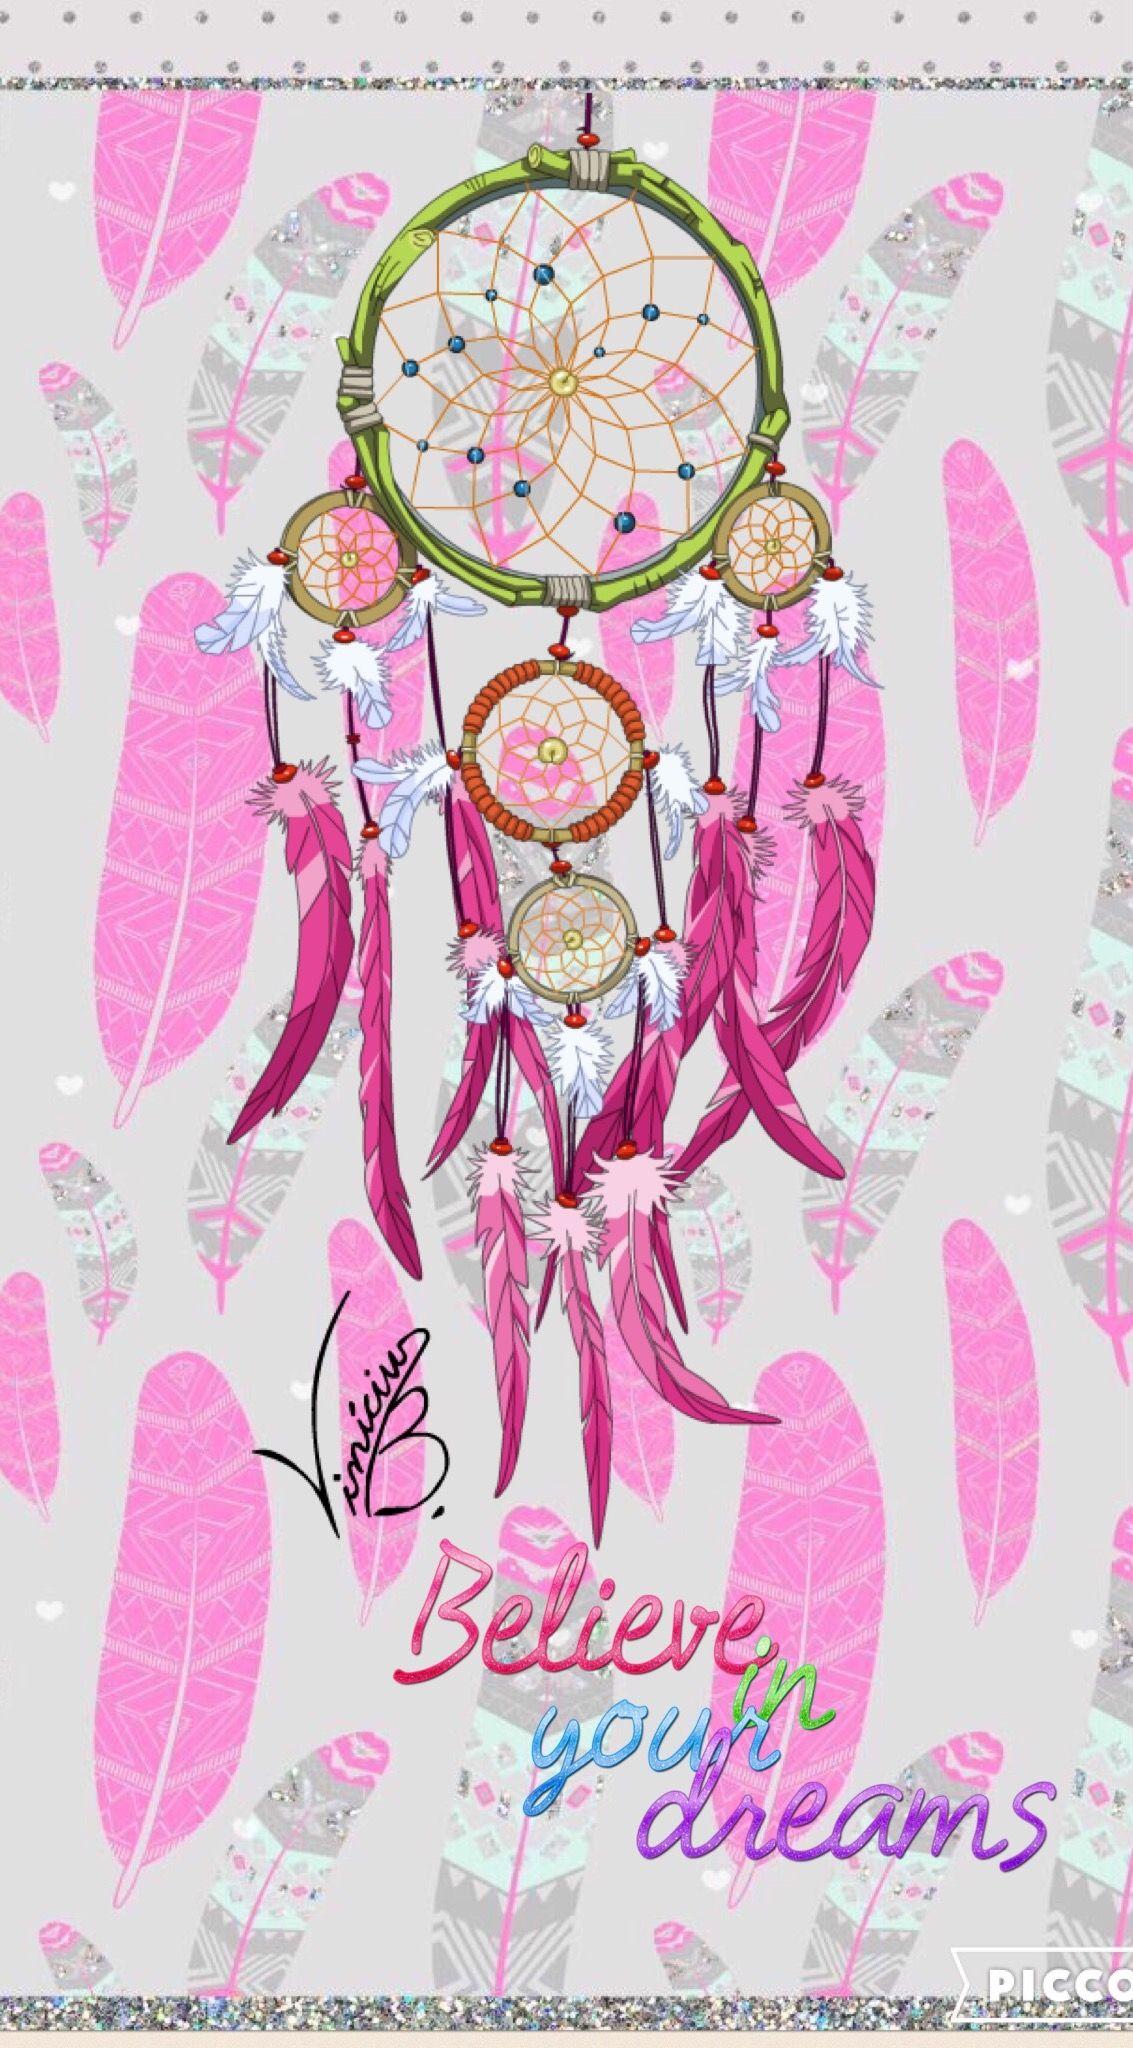 Wallpaper iphone dream catcher - Dreams Pink Dreamcatcher Wallpaperwallpaper